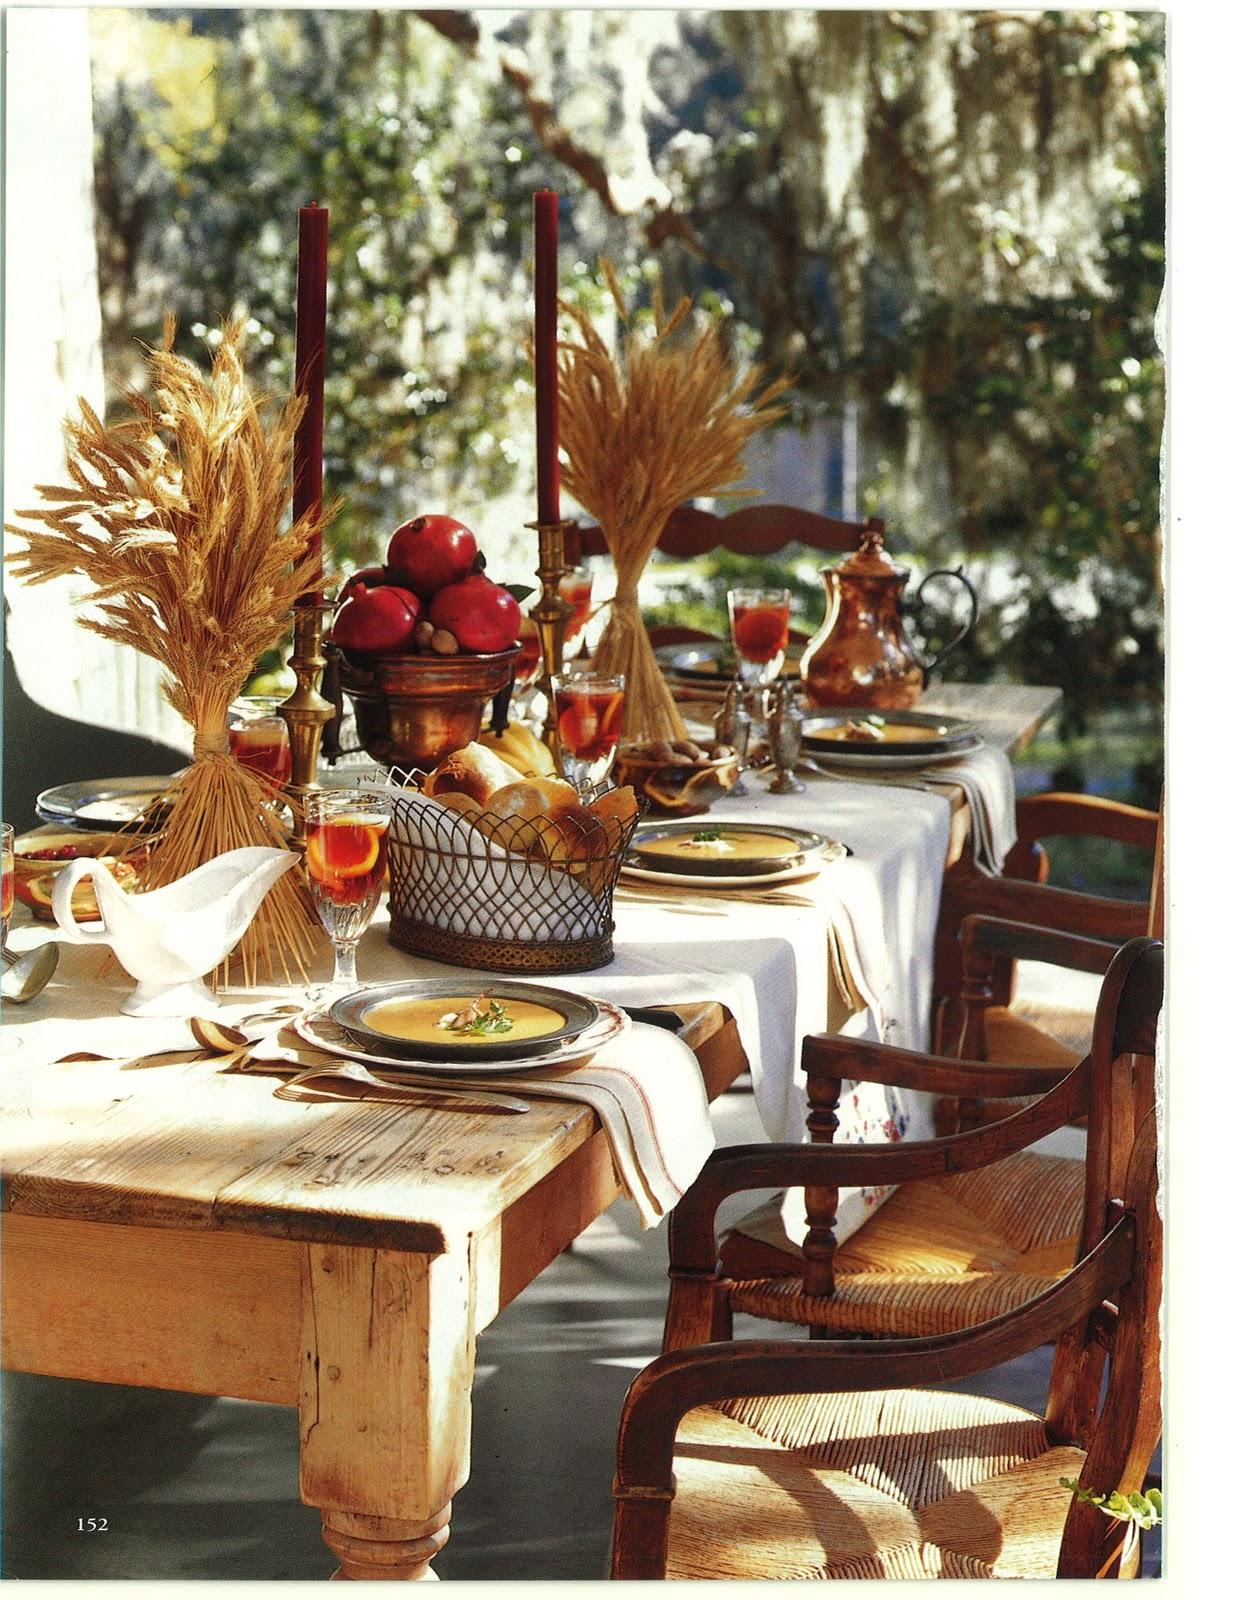 Henhurst decorating and dining thanksgiving for Pottery barn thanksgiving